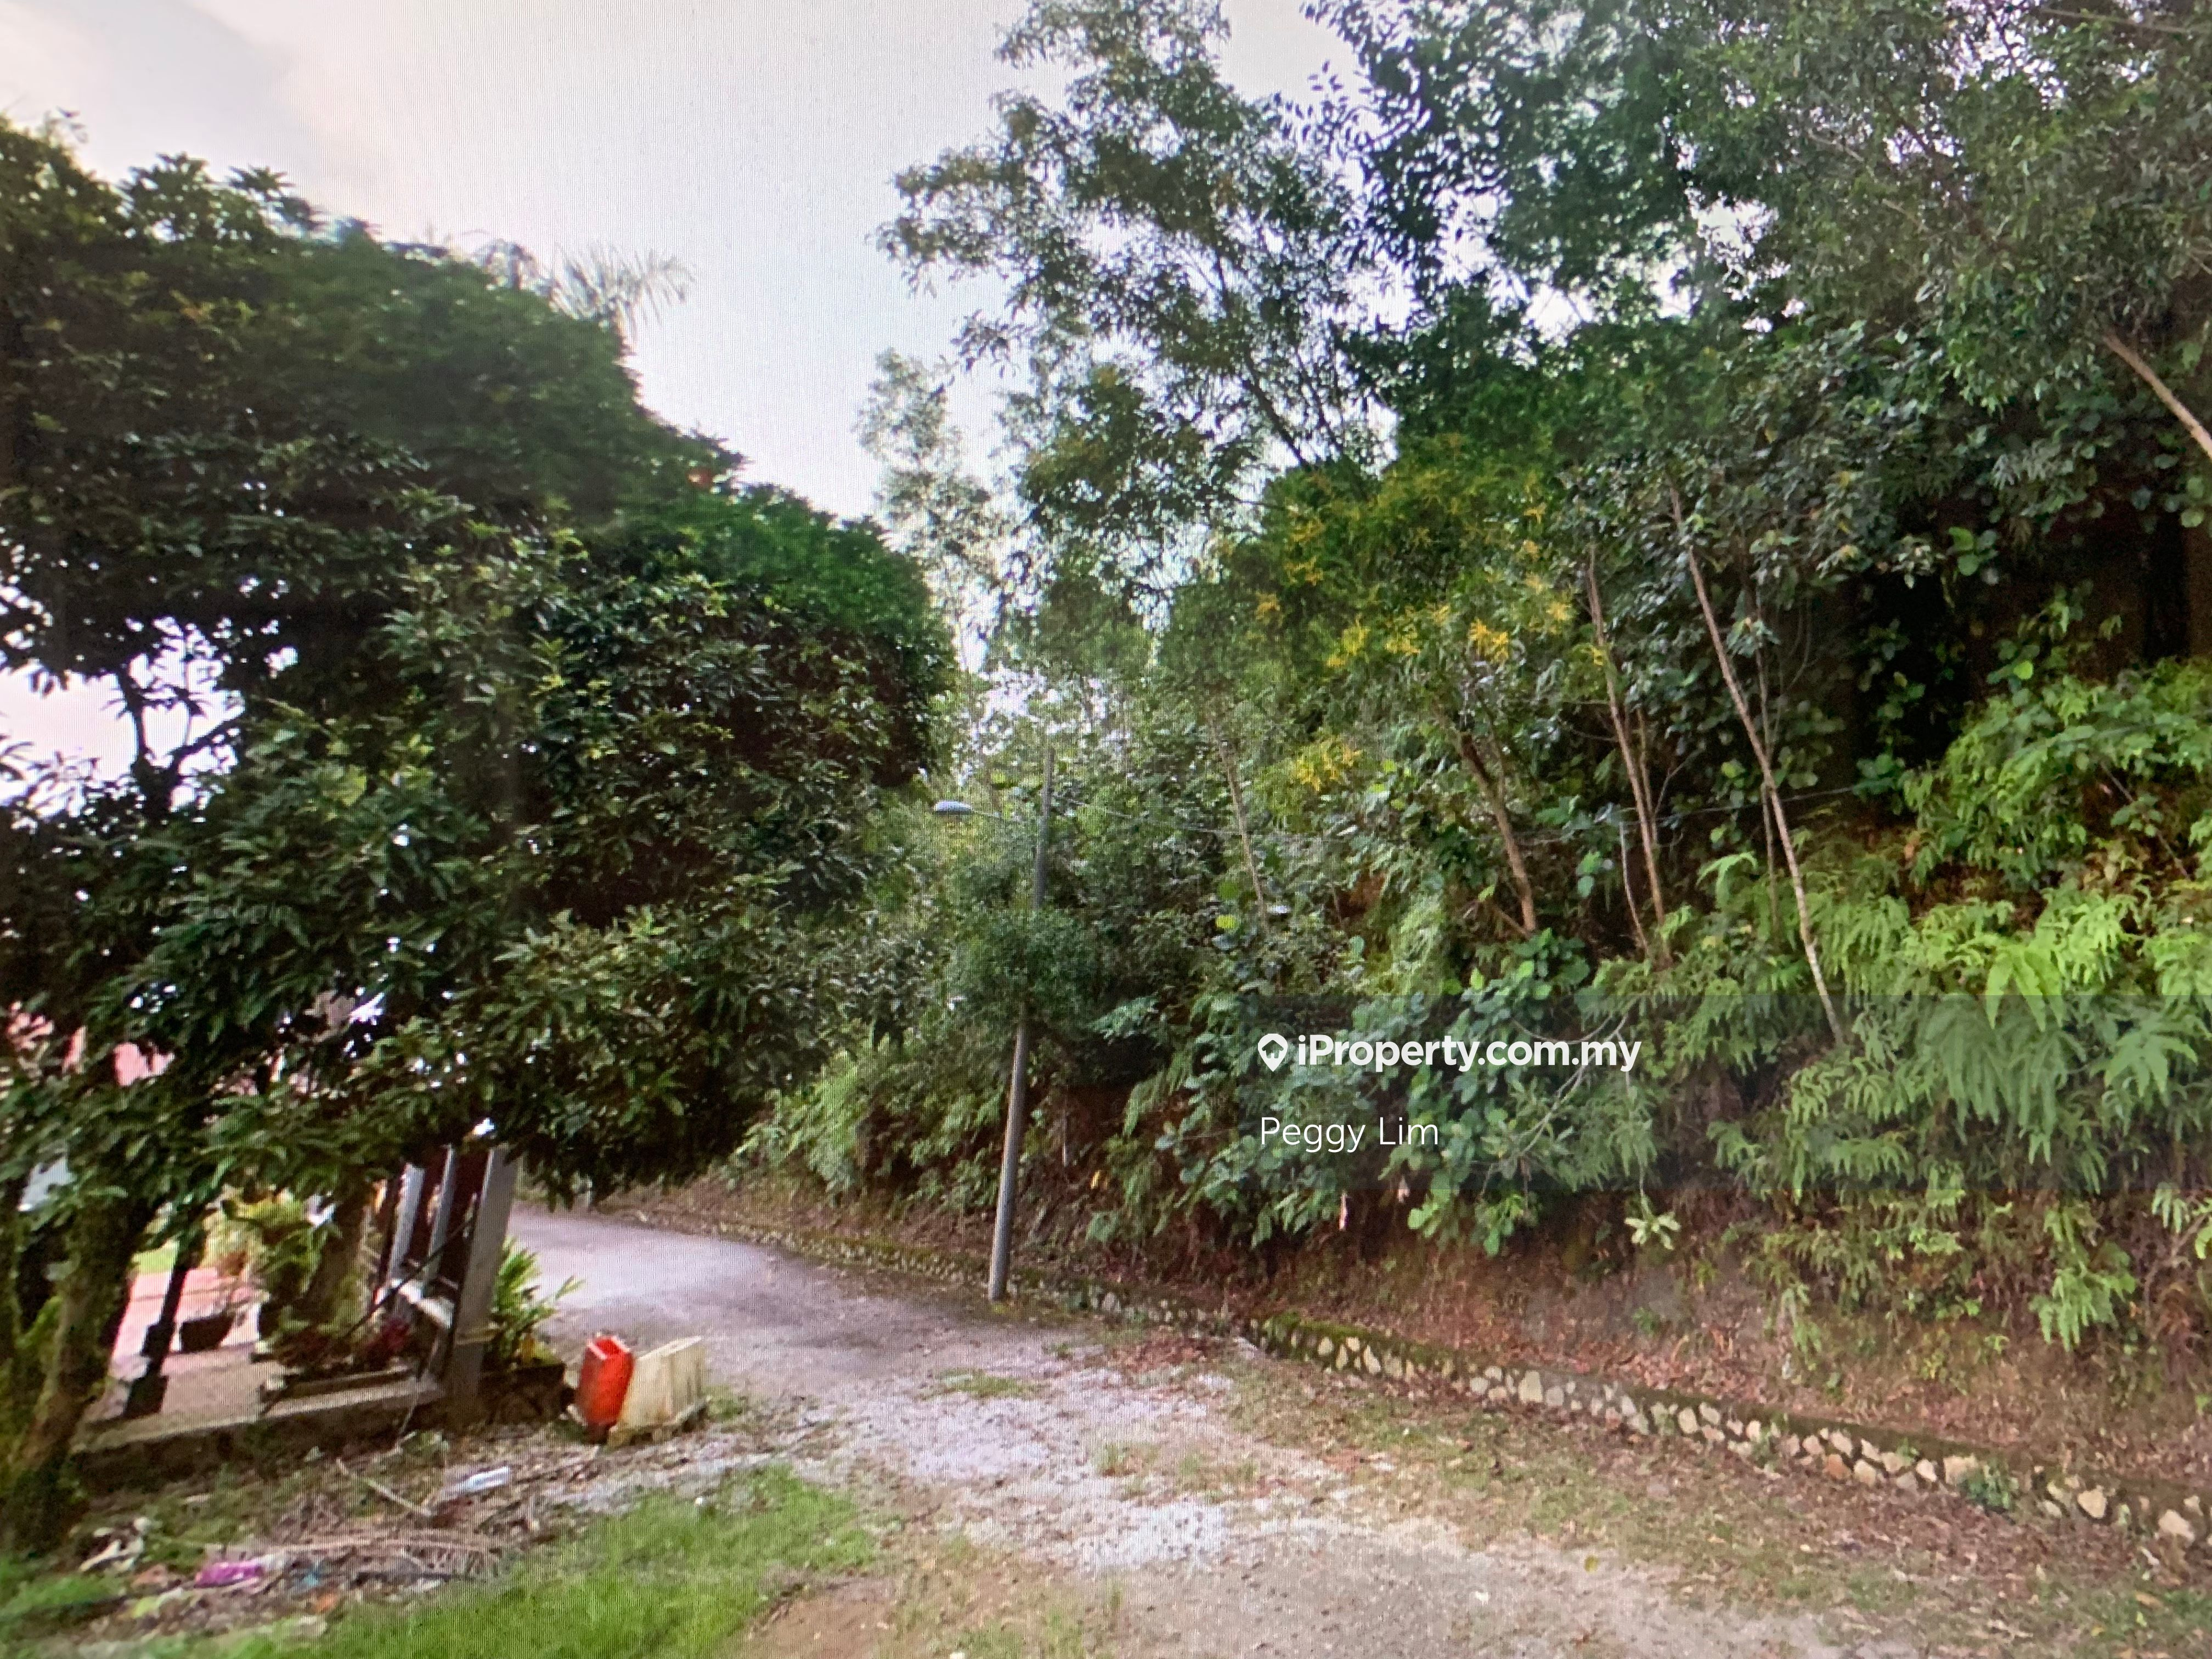 Setapak, Gombak Agicultural Land., Setapak , Gombak